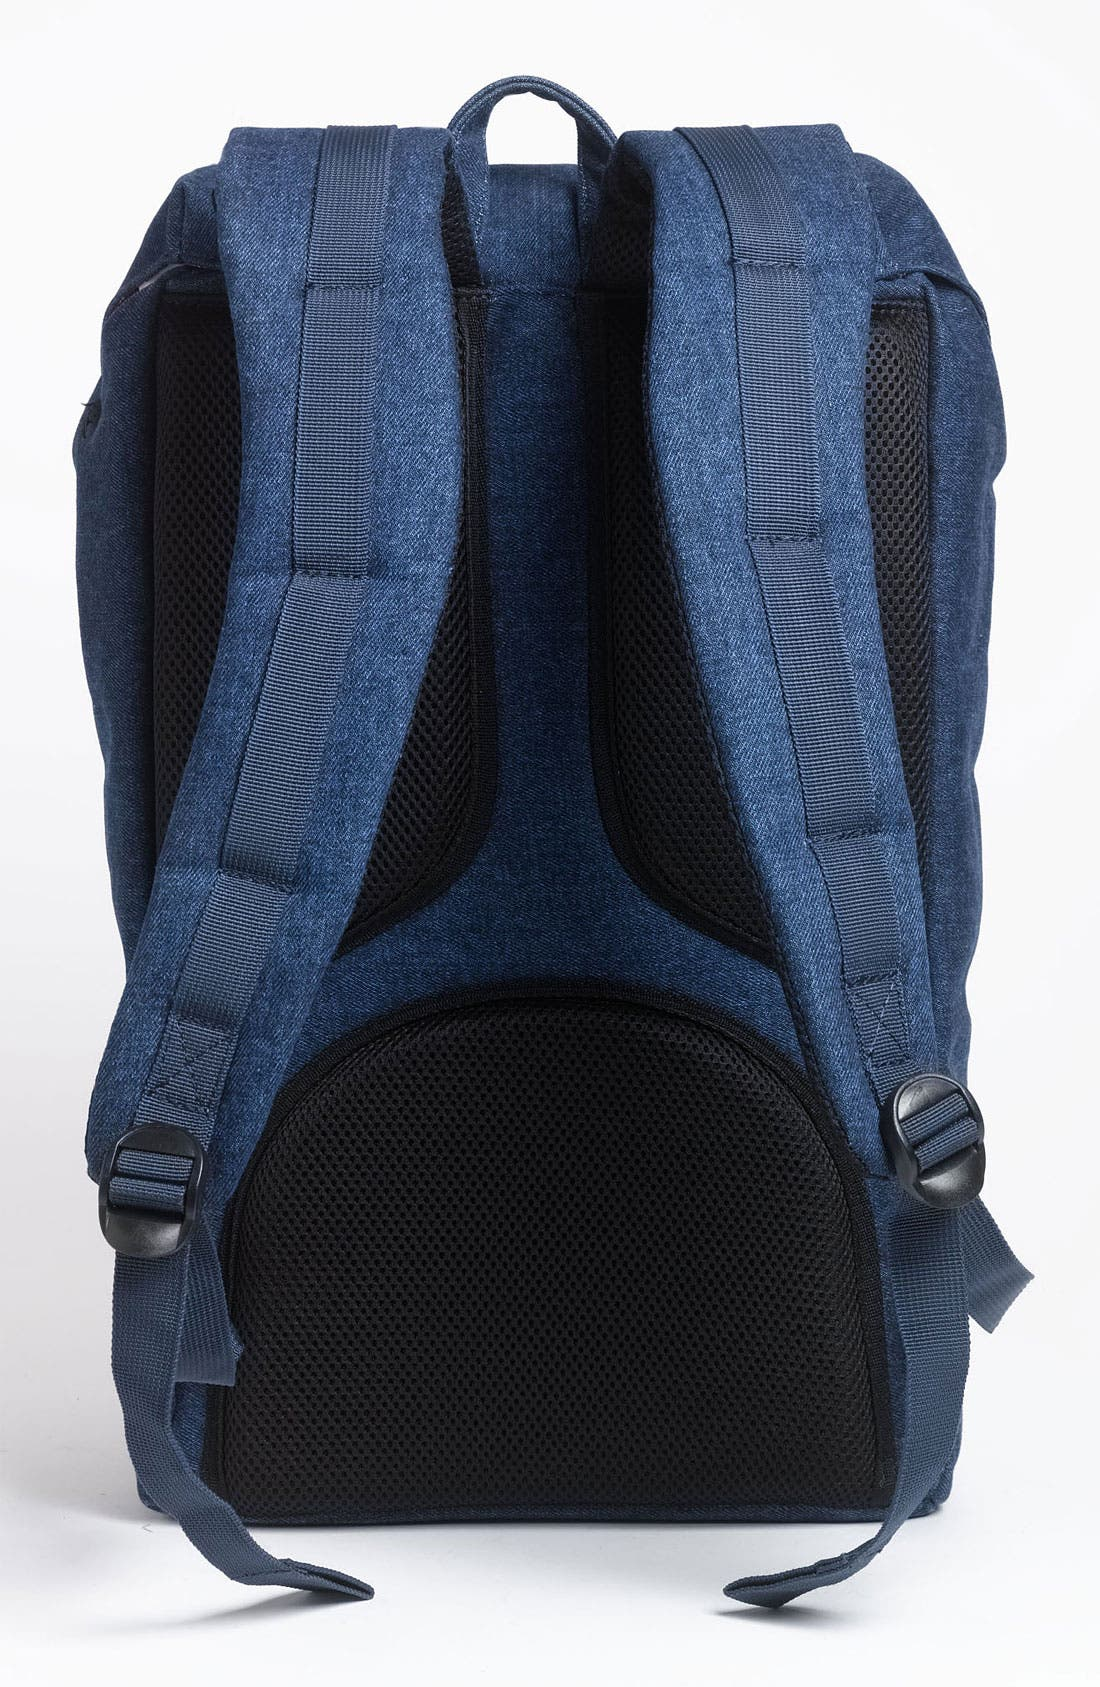 Alternate Image 2  - Herschel Supply Co. 'Little America - Denim Collection' Backpack